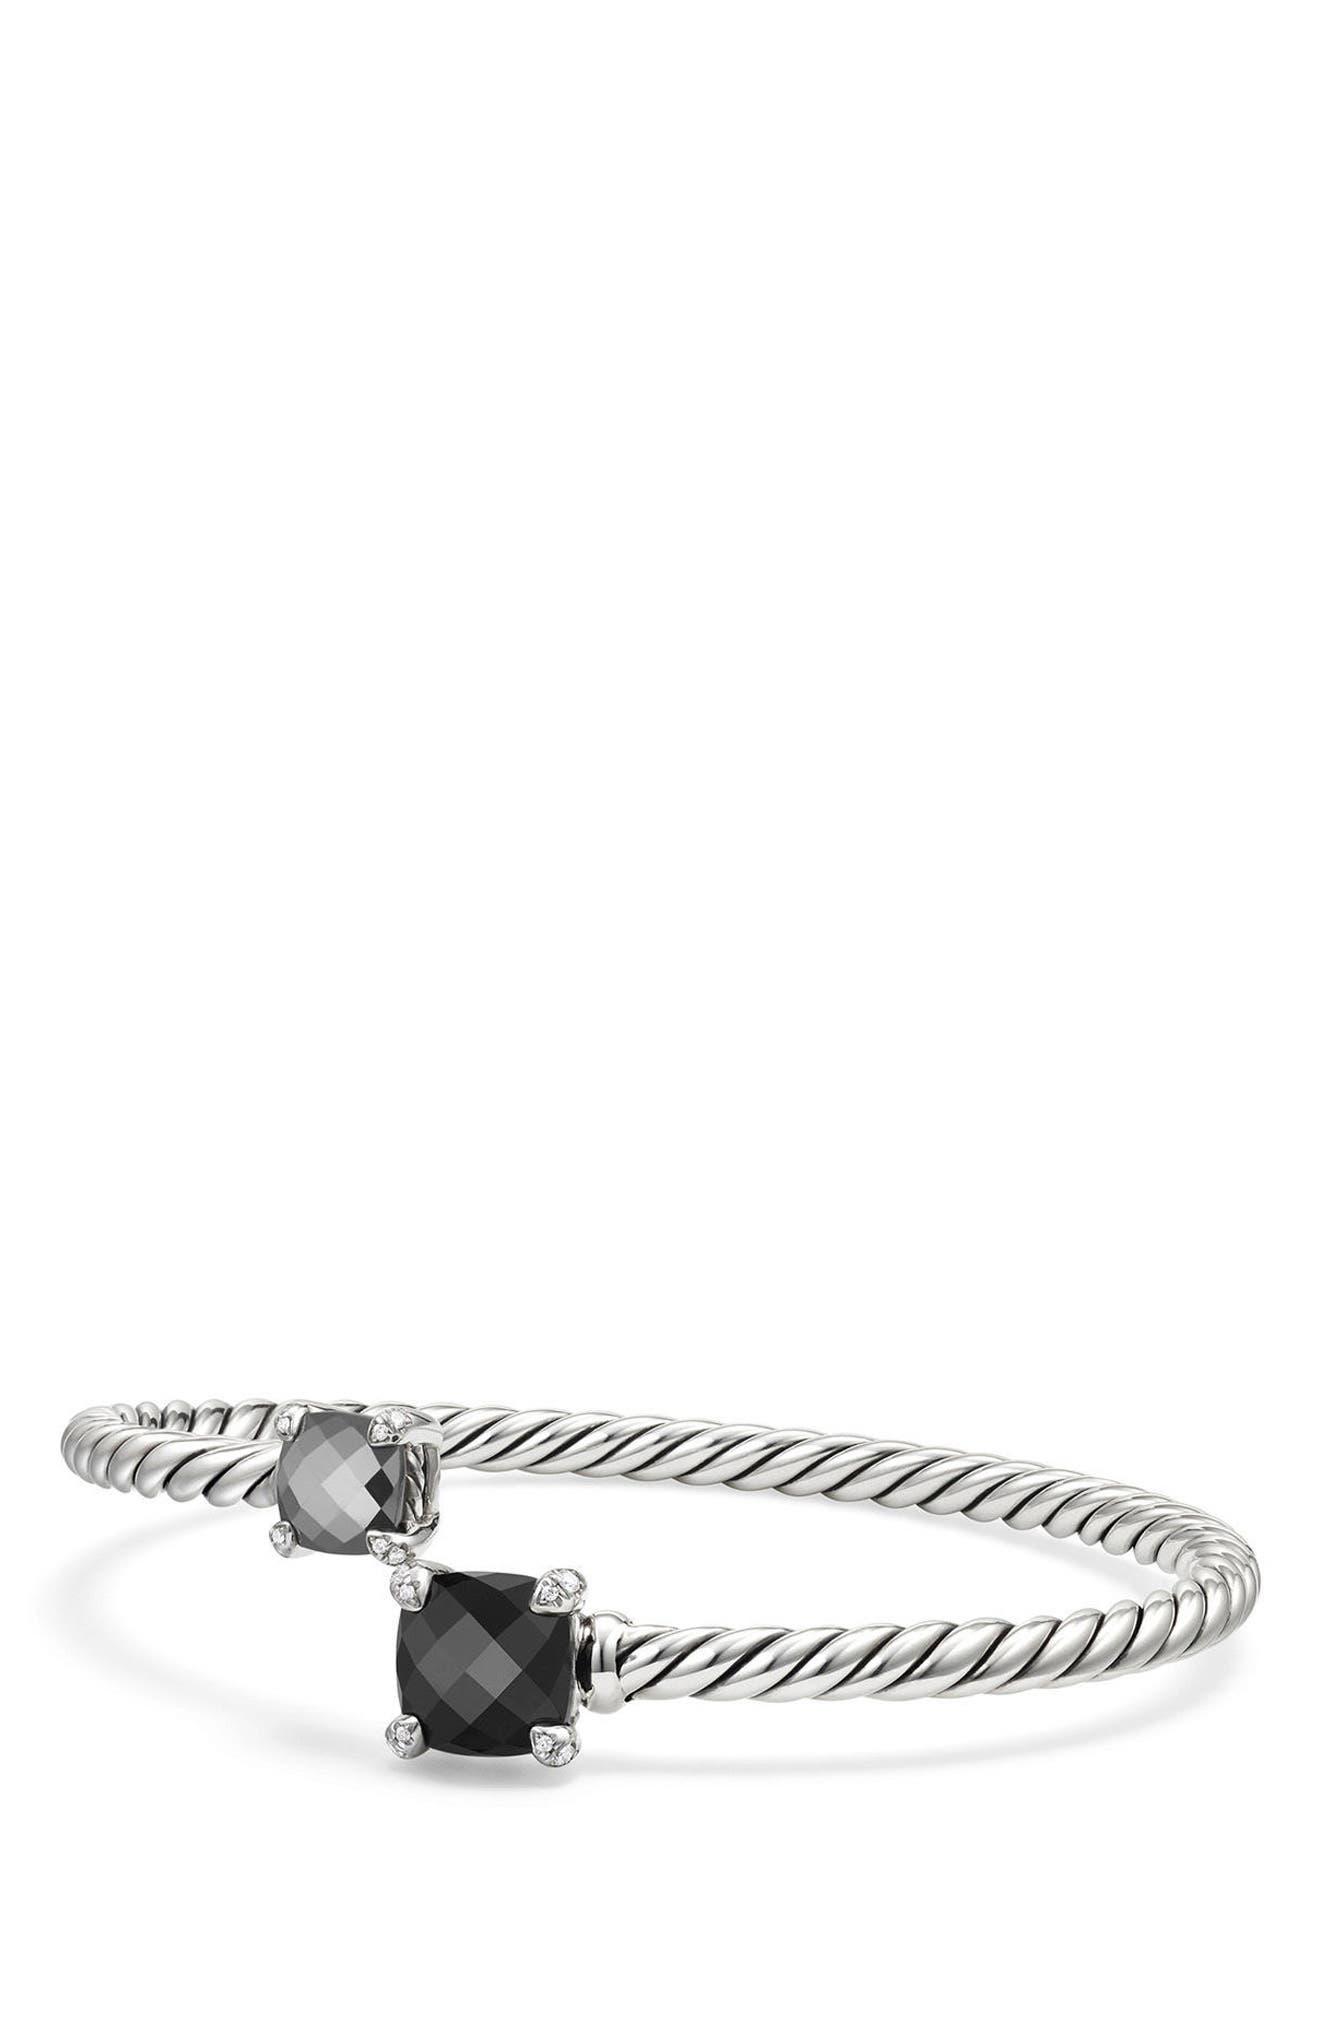 Chatelaine Bypass Bracelet with Diamonds,                             Main thumbnail 1, color,                             BLACK ONYX